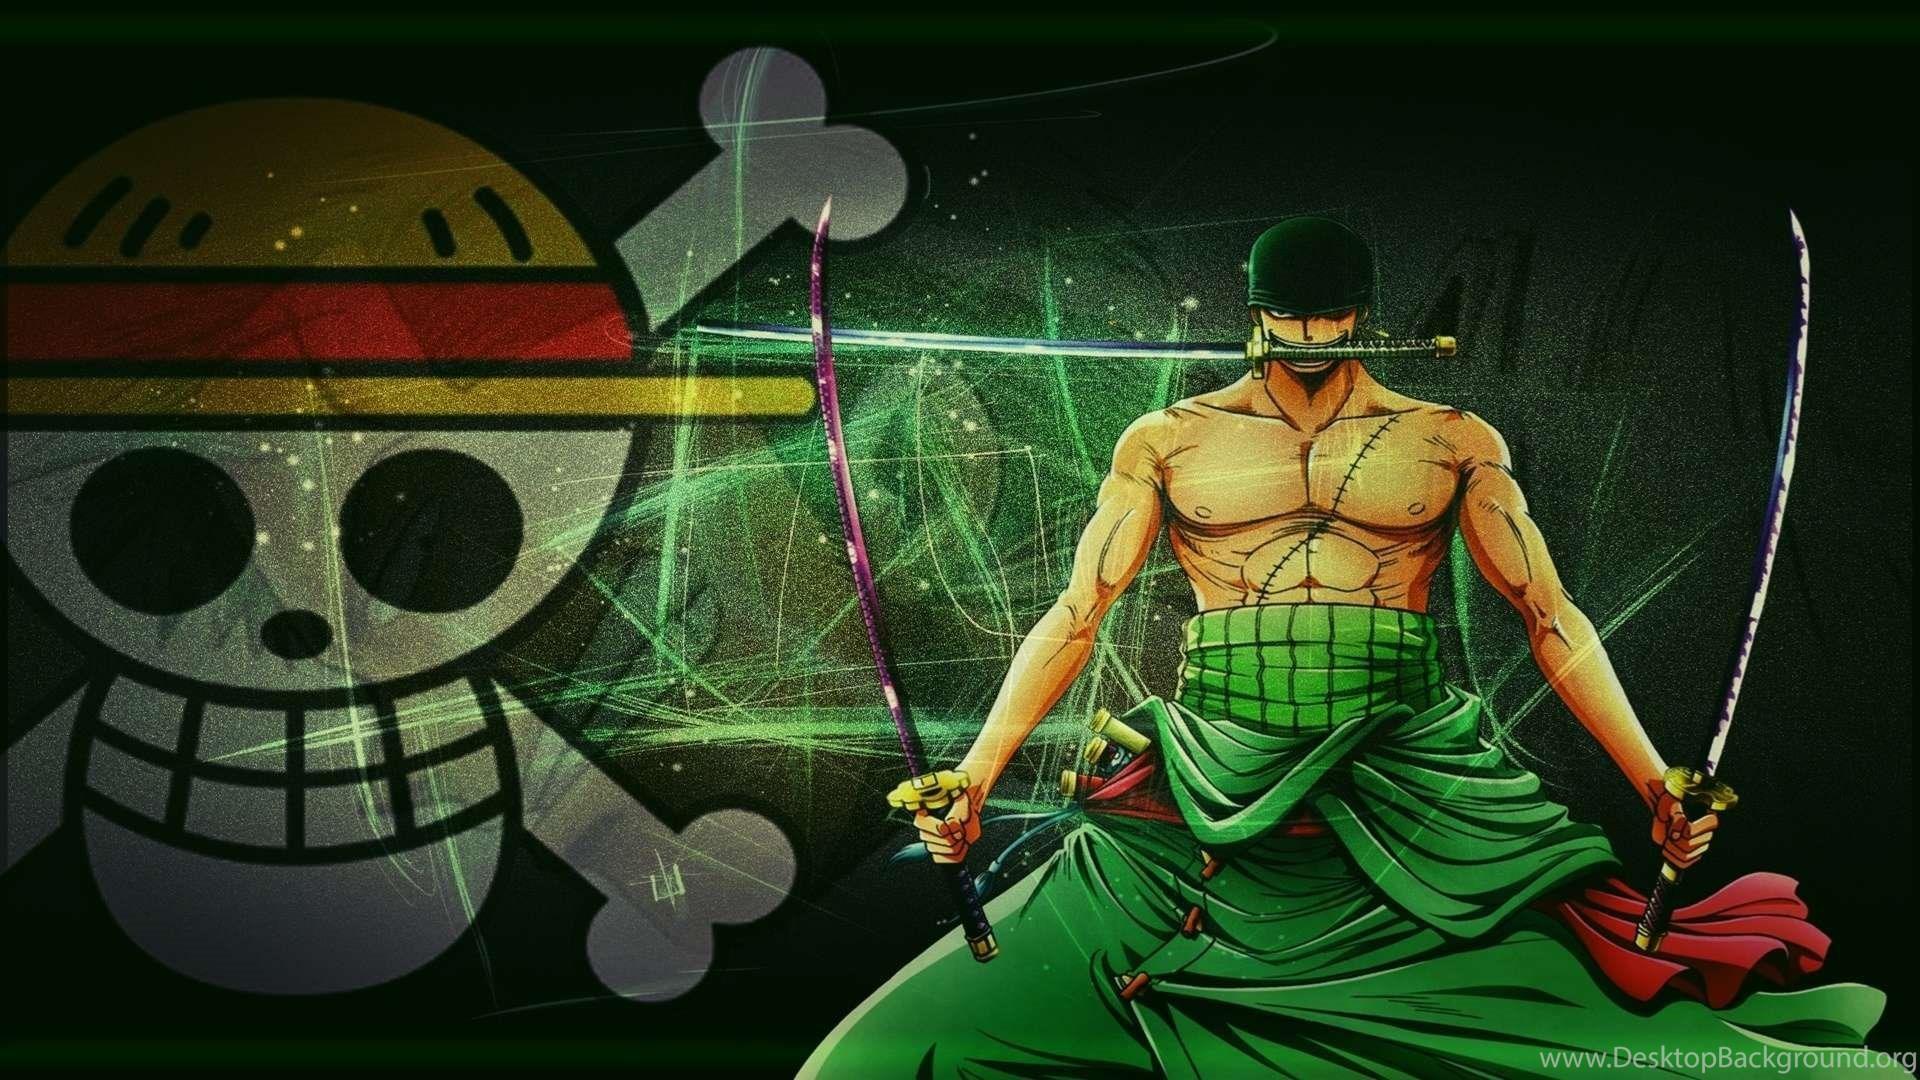 Free Download One Piece Roronoa Zoro 1080p Hd Wallpapers Desktop Background